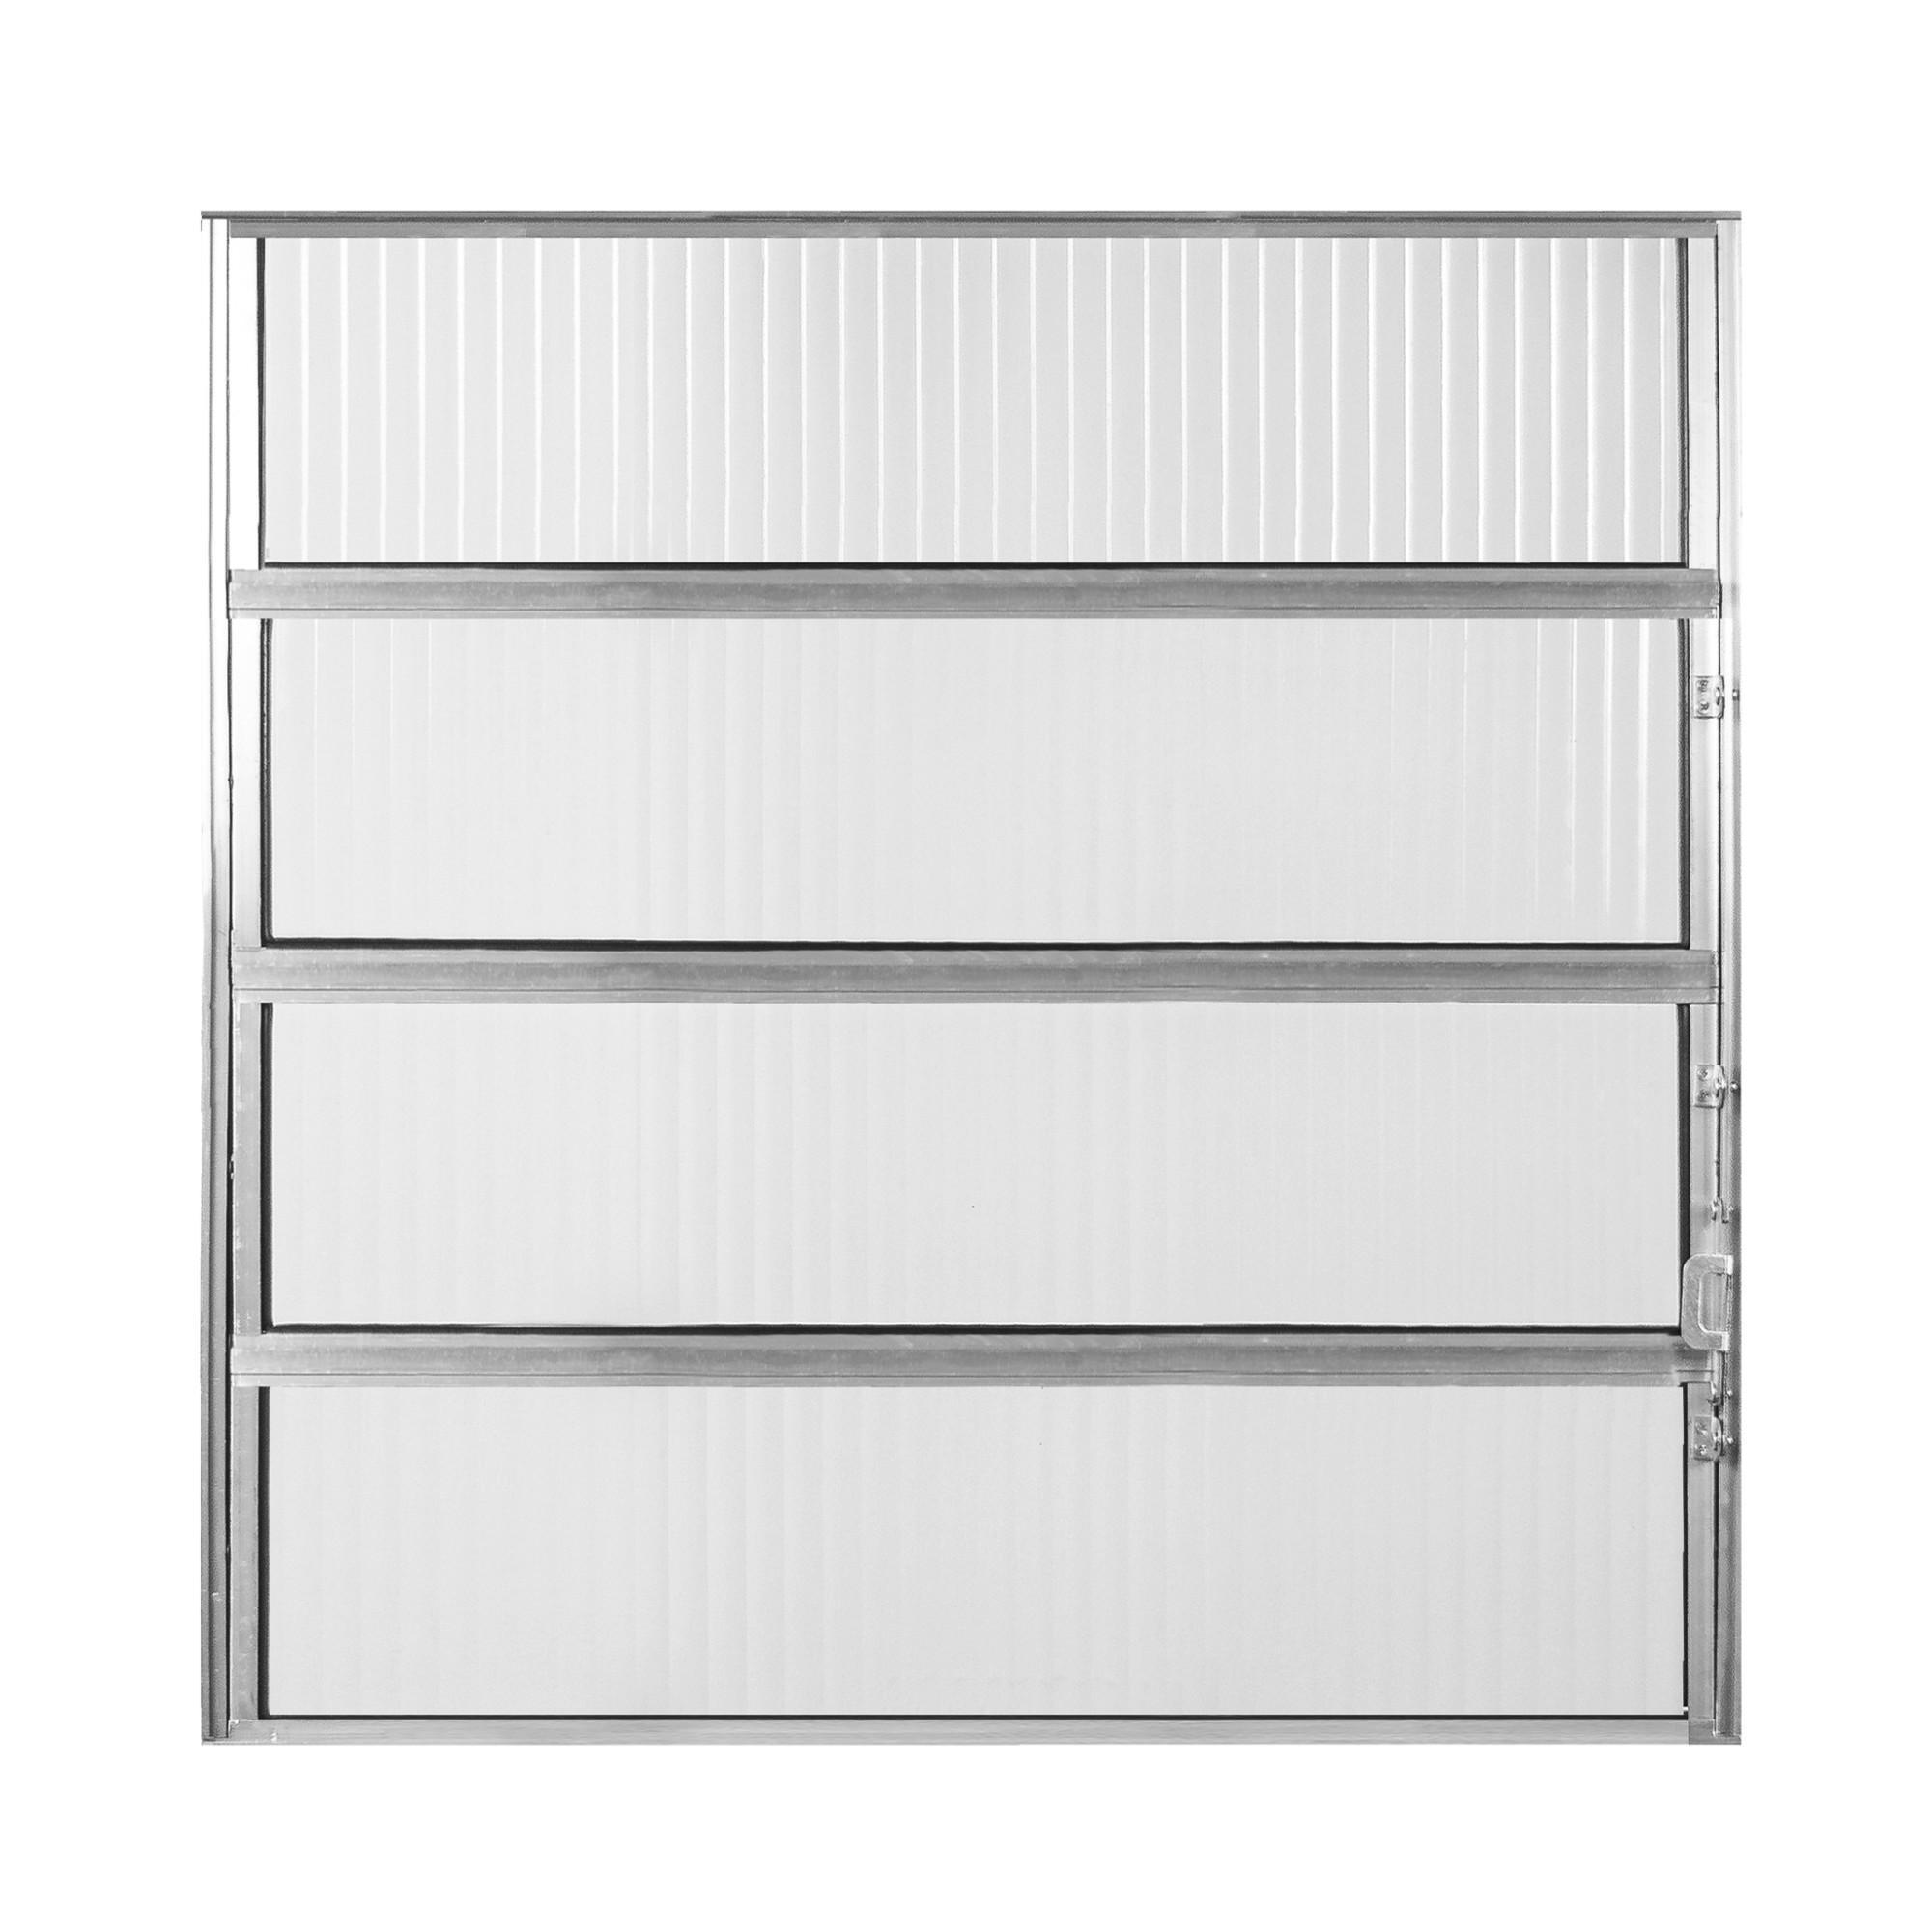 Janela de Abrir Basculante de Aluminio Vidro Canelado 80x80 cm Cinza - Aluvid